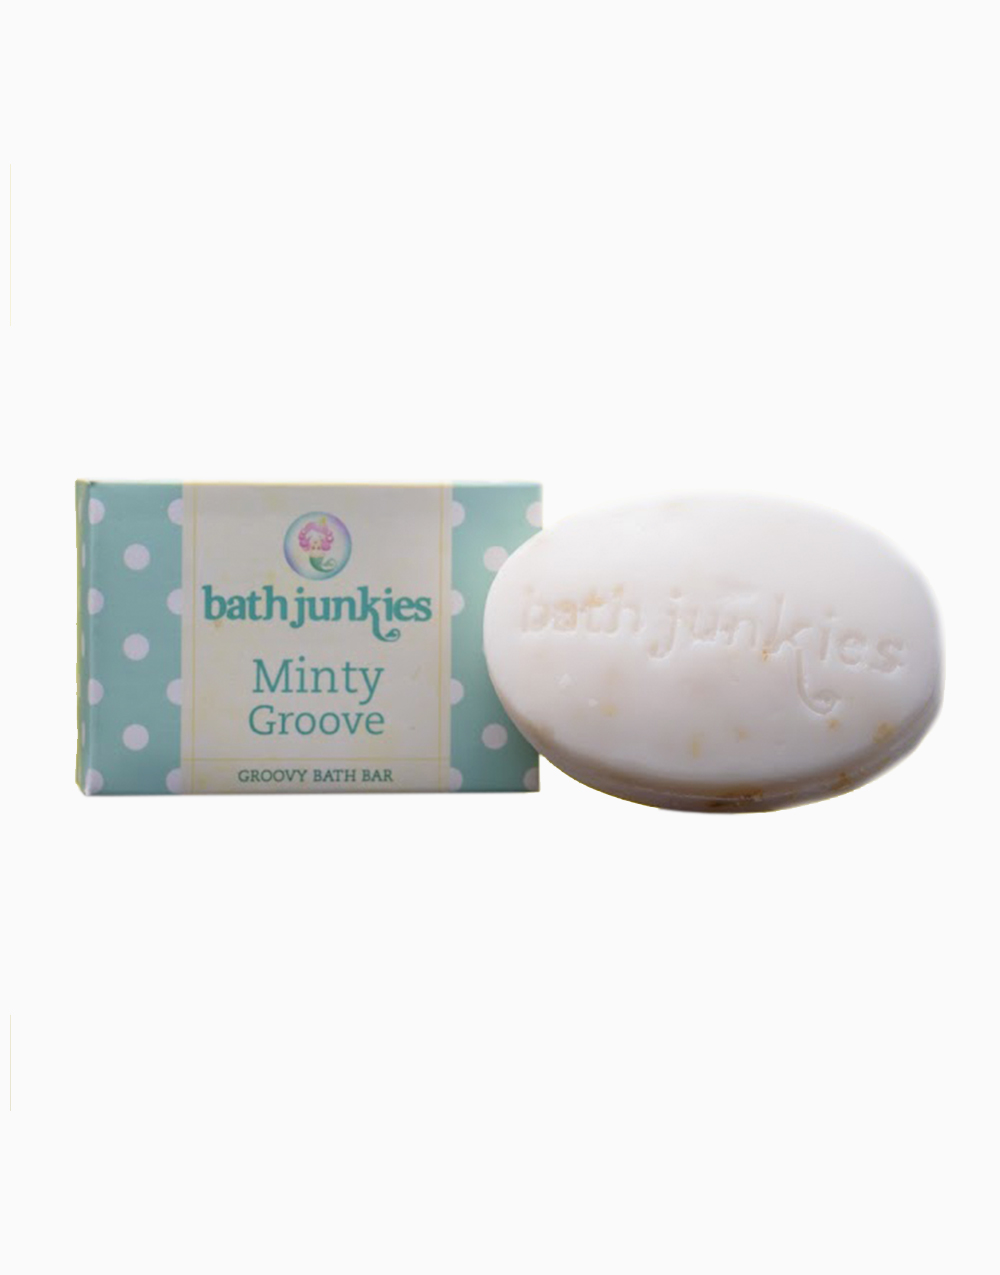 Minty Groove Groovy Bath Bar by Bath Junkies